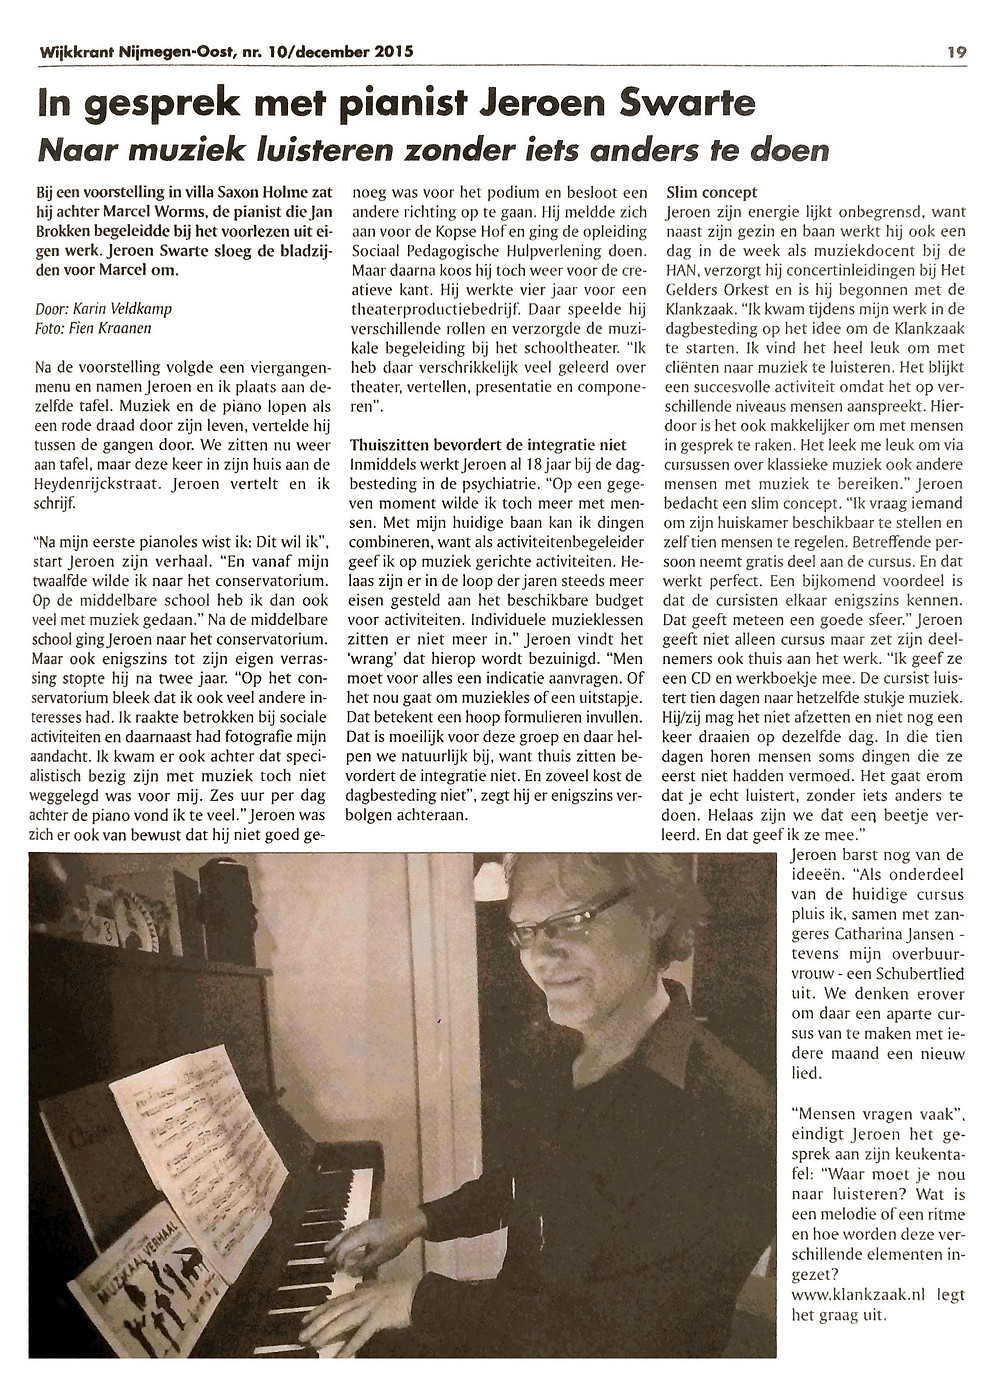 Interview Jeroen Swarte wijkkrant Nijmegen-Oost